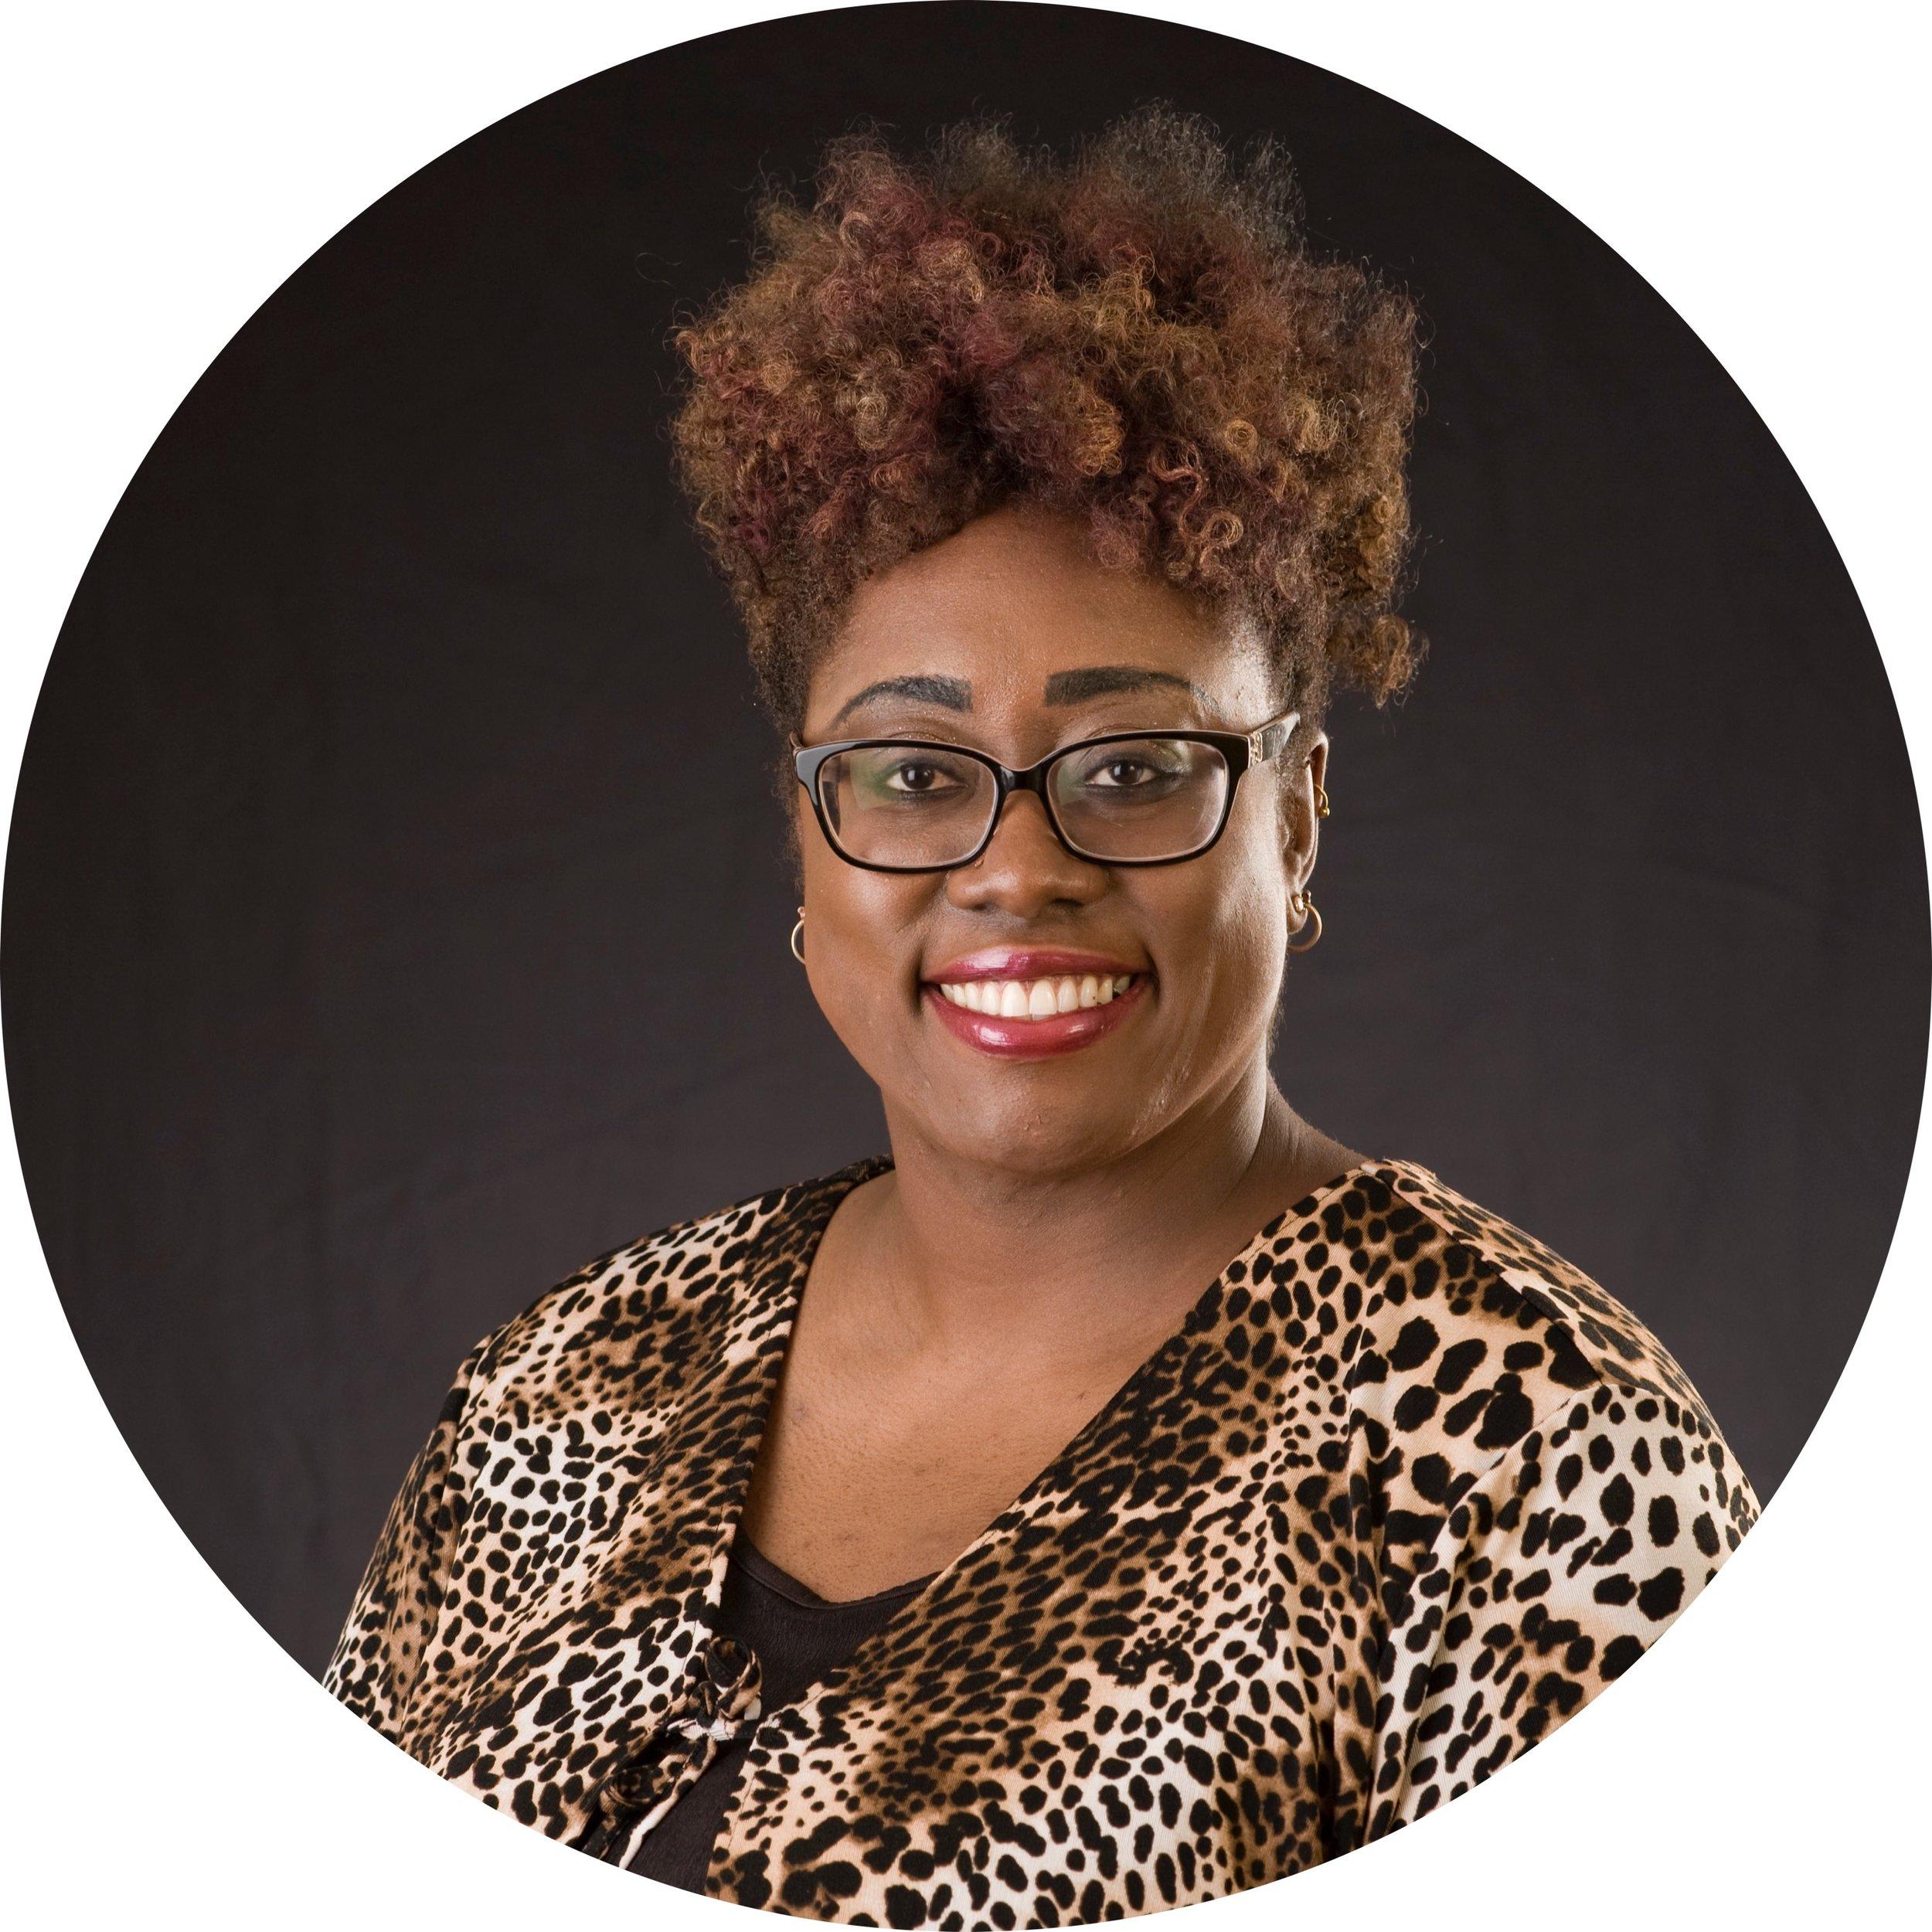 Martecia Cooper - Instructor, Butler County Community College